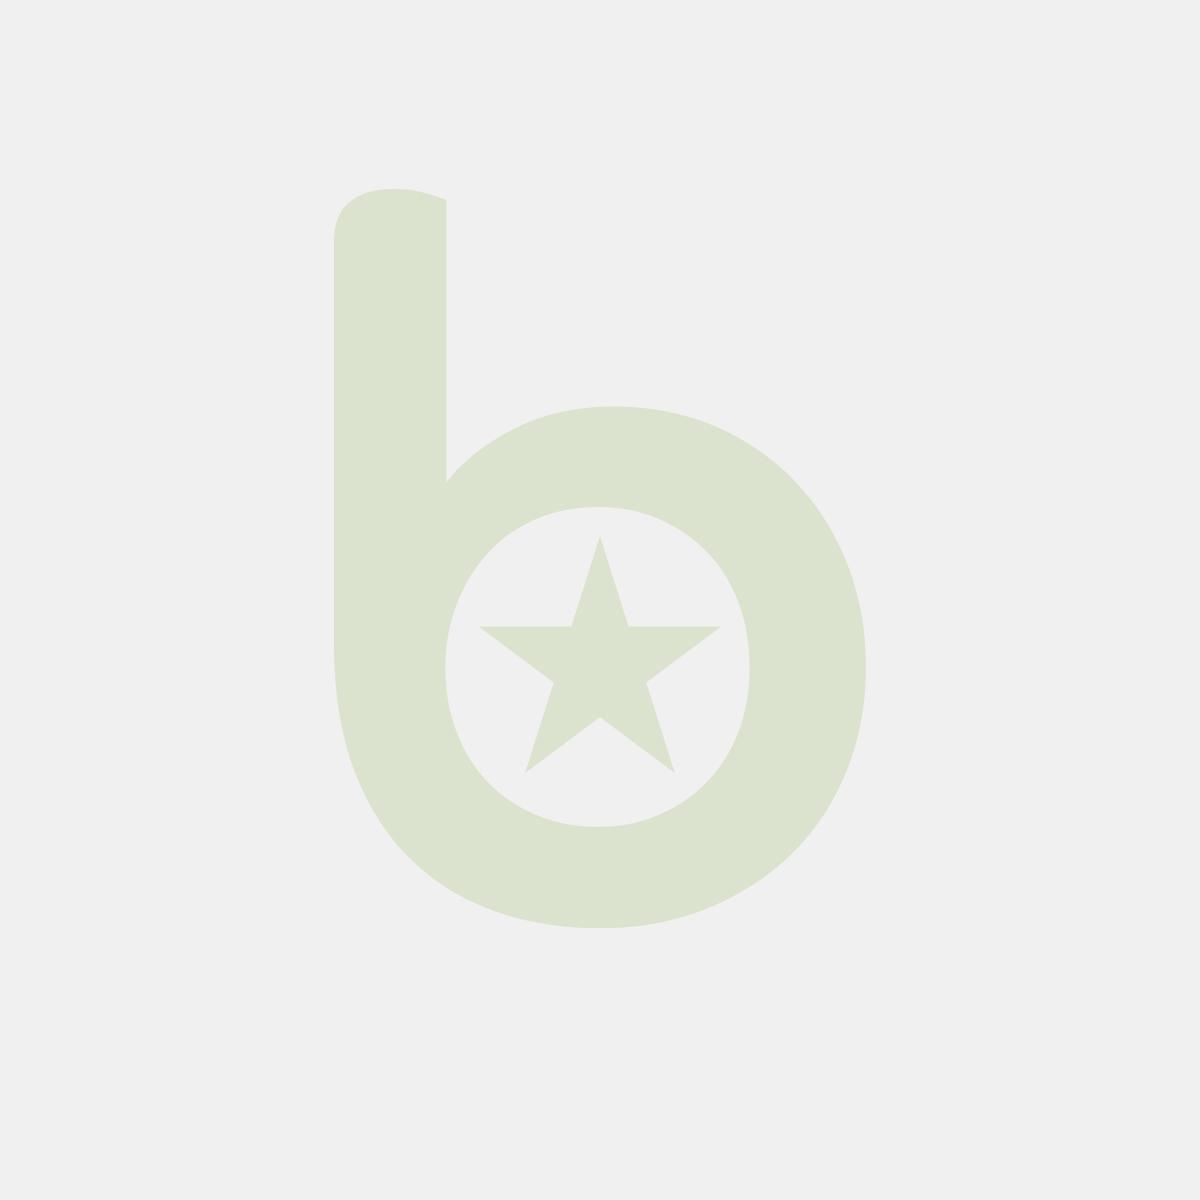 BF001 Gaśnica 150x150mm PS - płyta sztywna TOPlight S-tandard